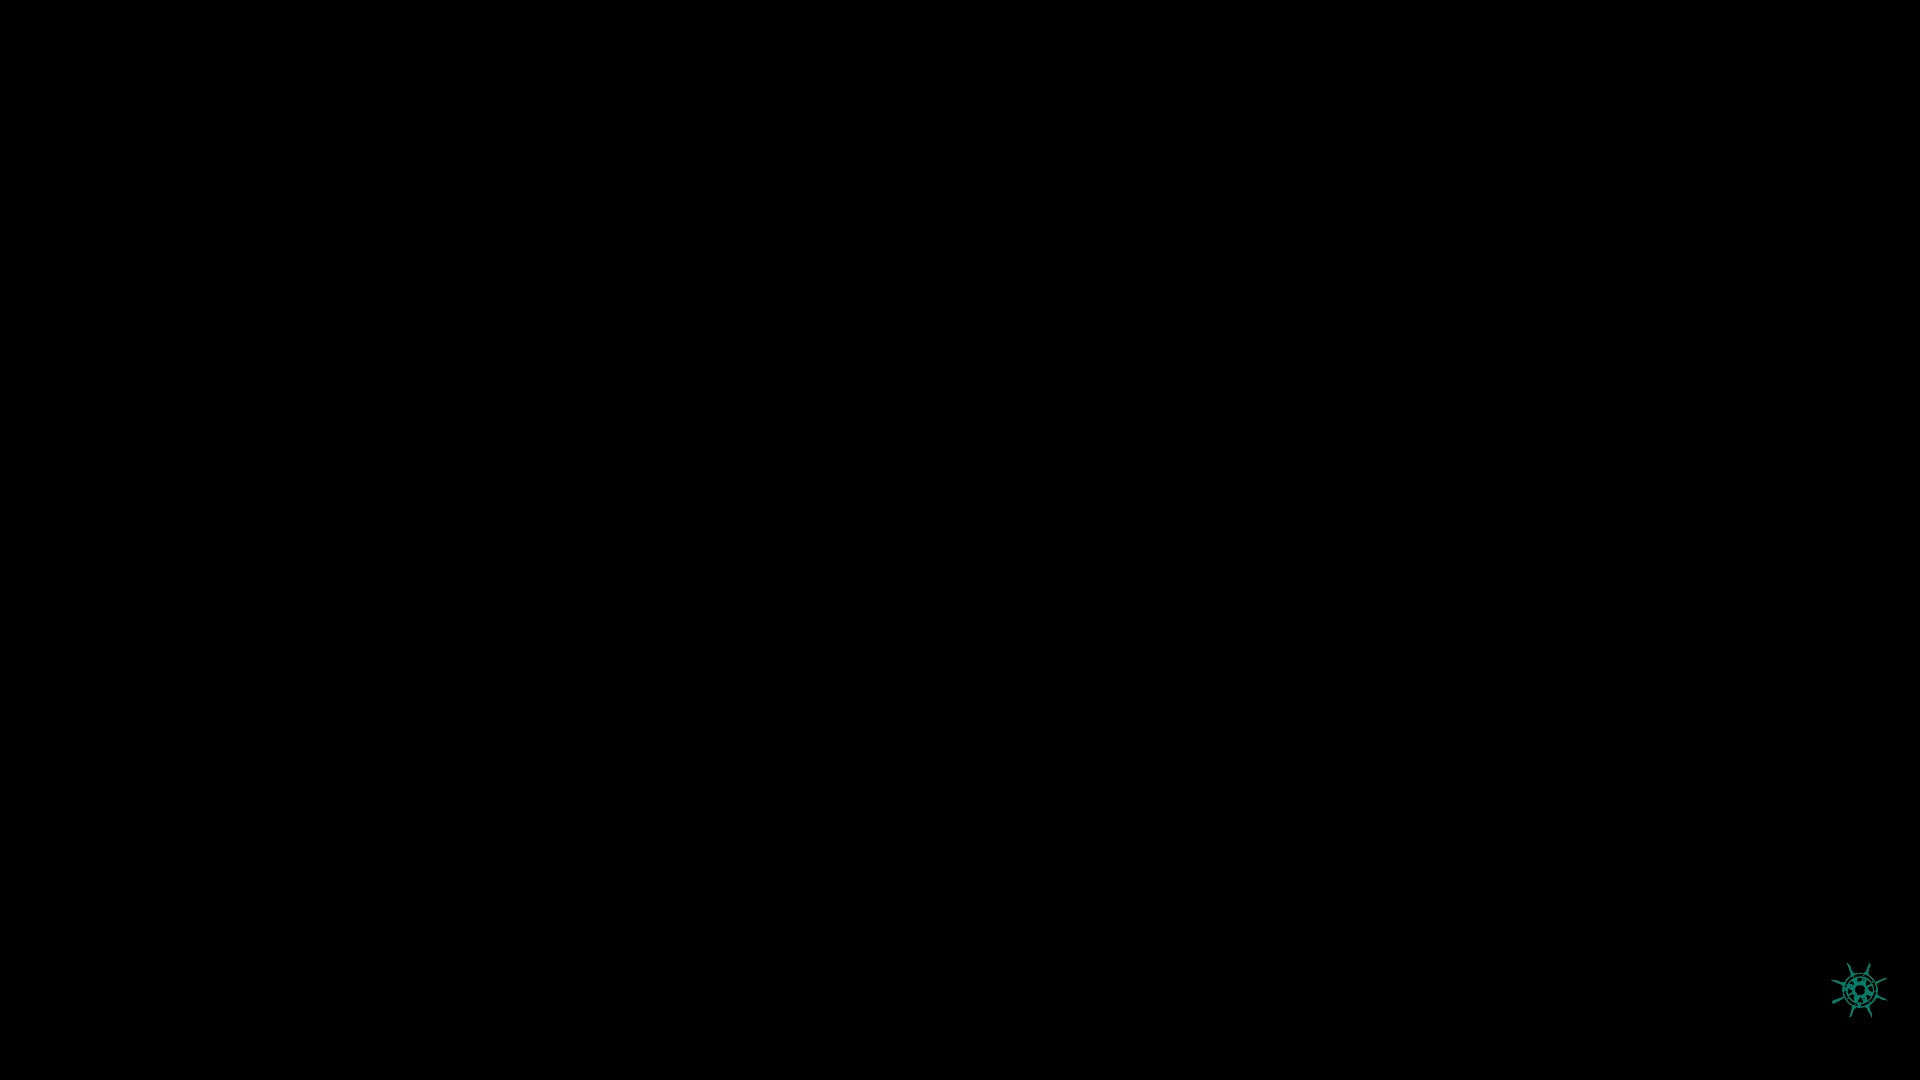 seaofthieves, Sea of Thieves 2019.03.08 - 02.52.48.18.DVR GIFs